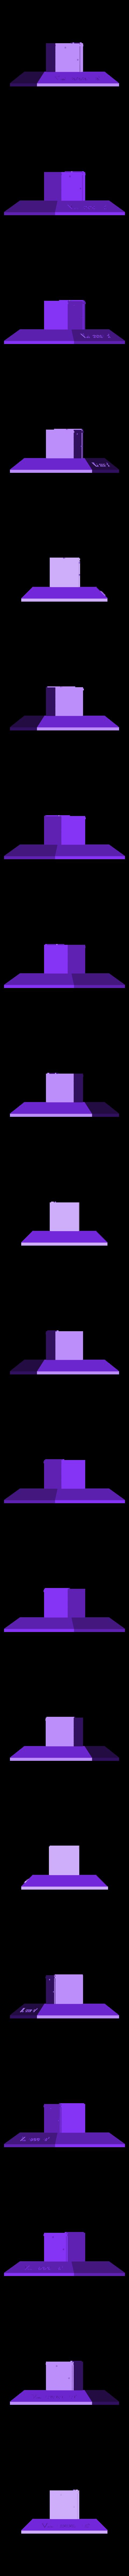 Cube.stl Download free STL file Formulas for calculating volumes • 3D printing model, hungerleooff